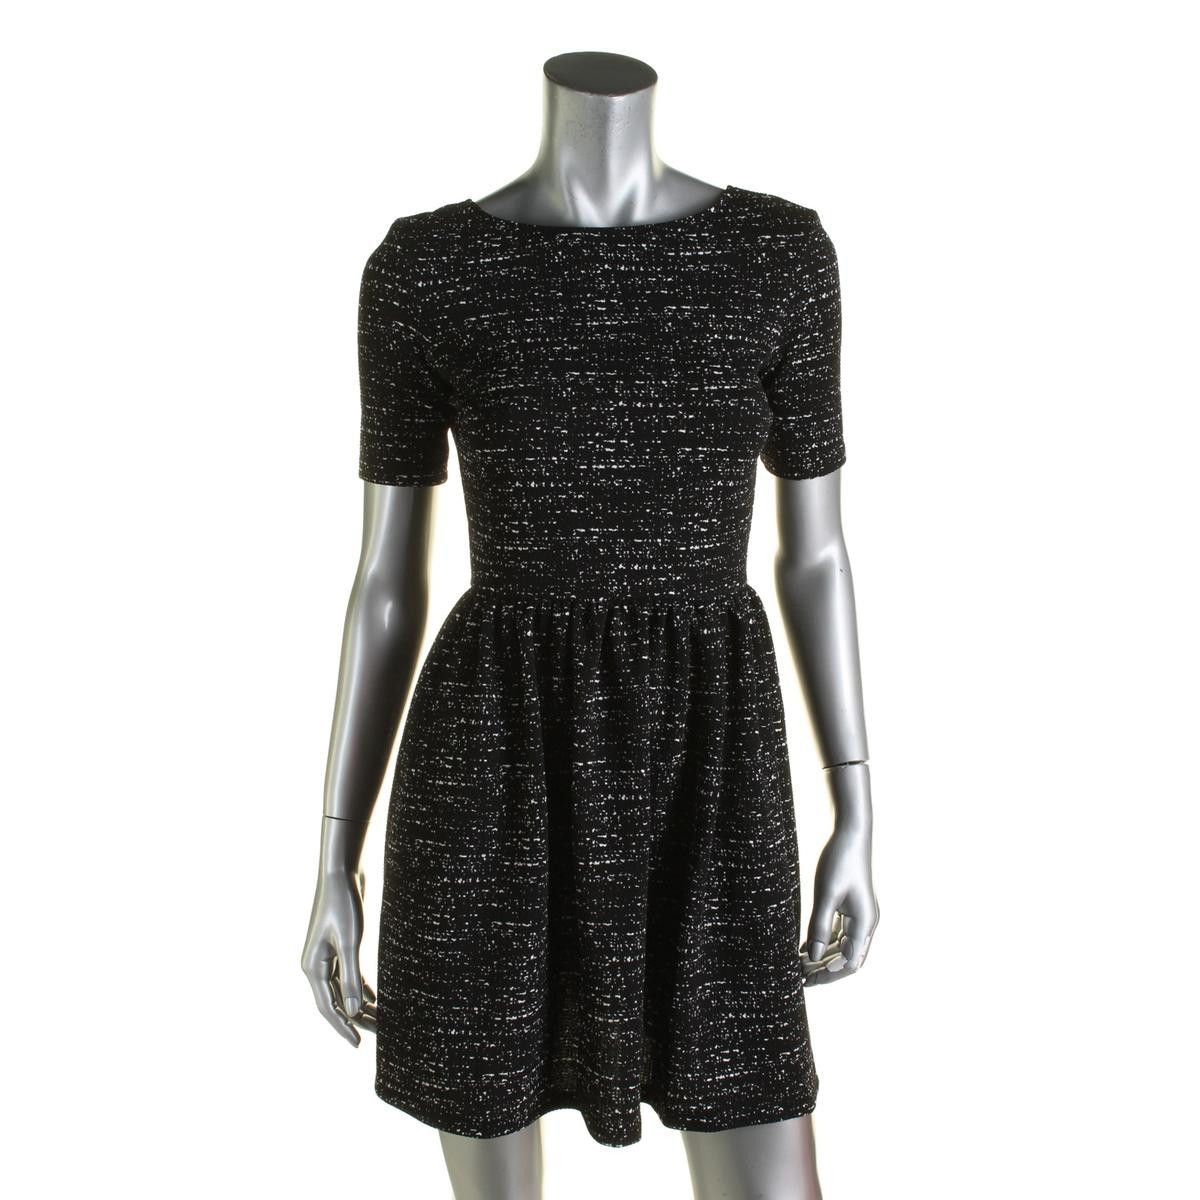 Bar Iii Womens Short Sleeves Mini Cocktail Dress Cocktail Dress